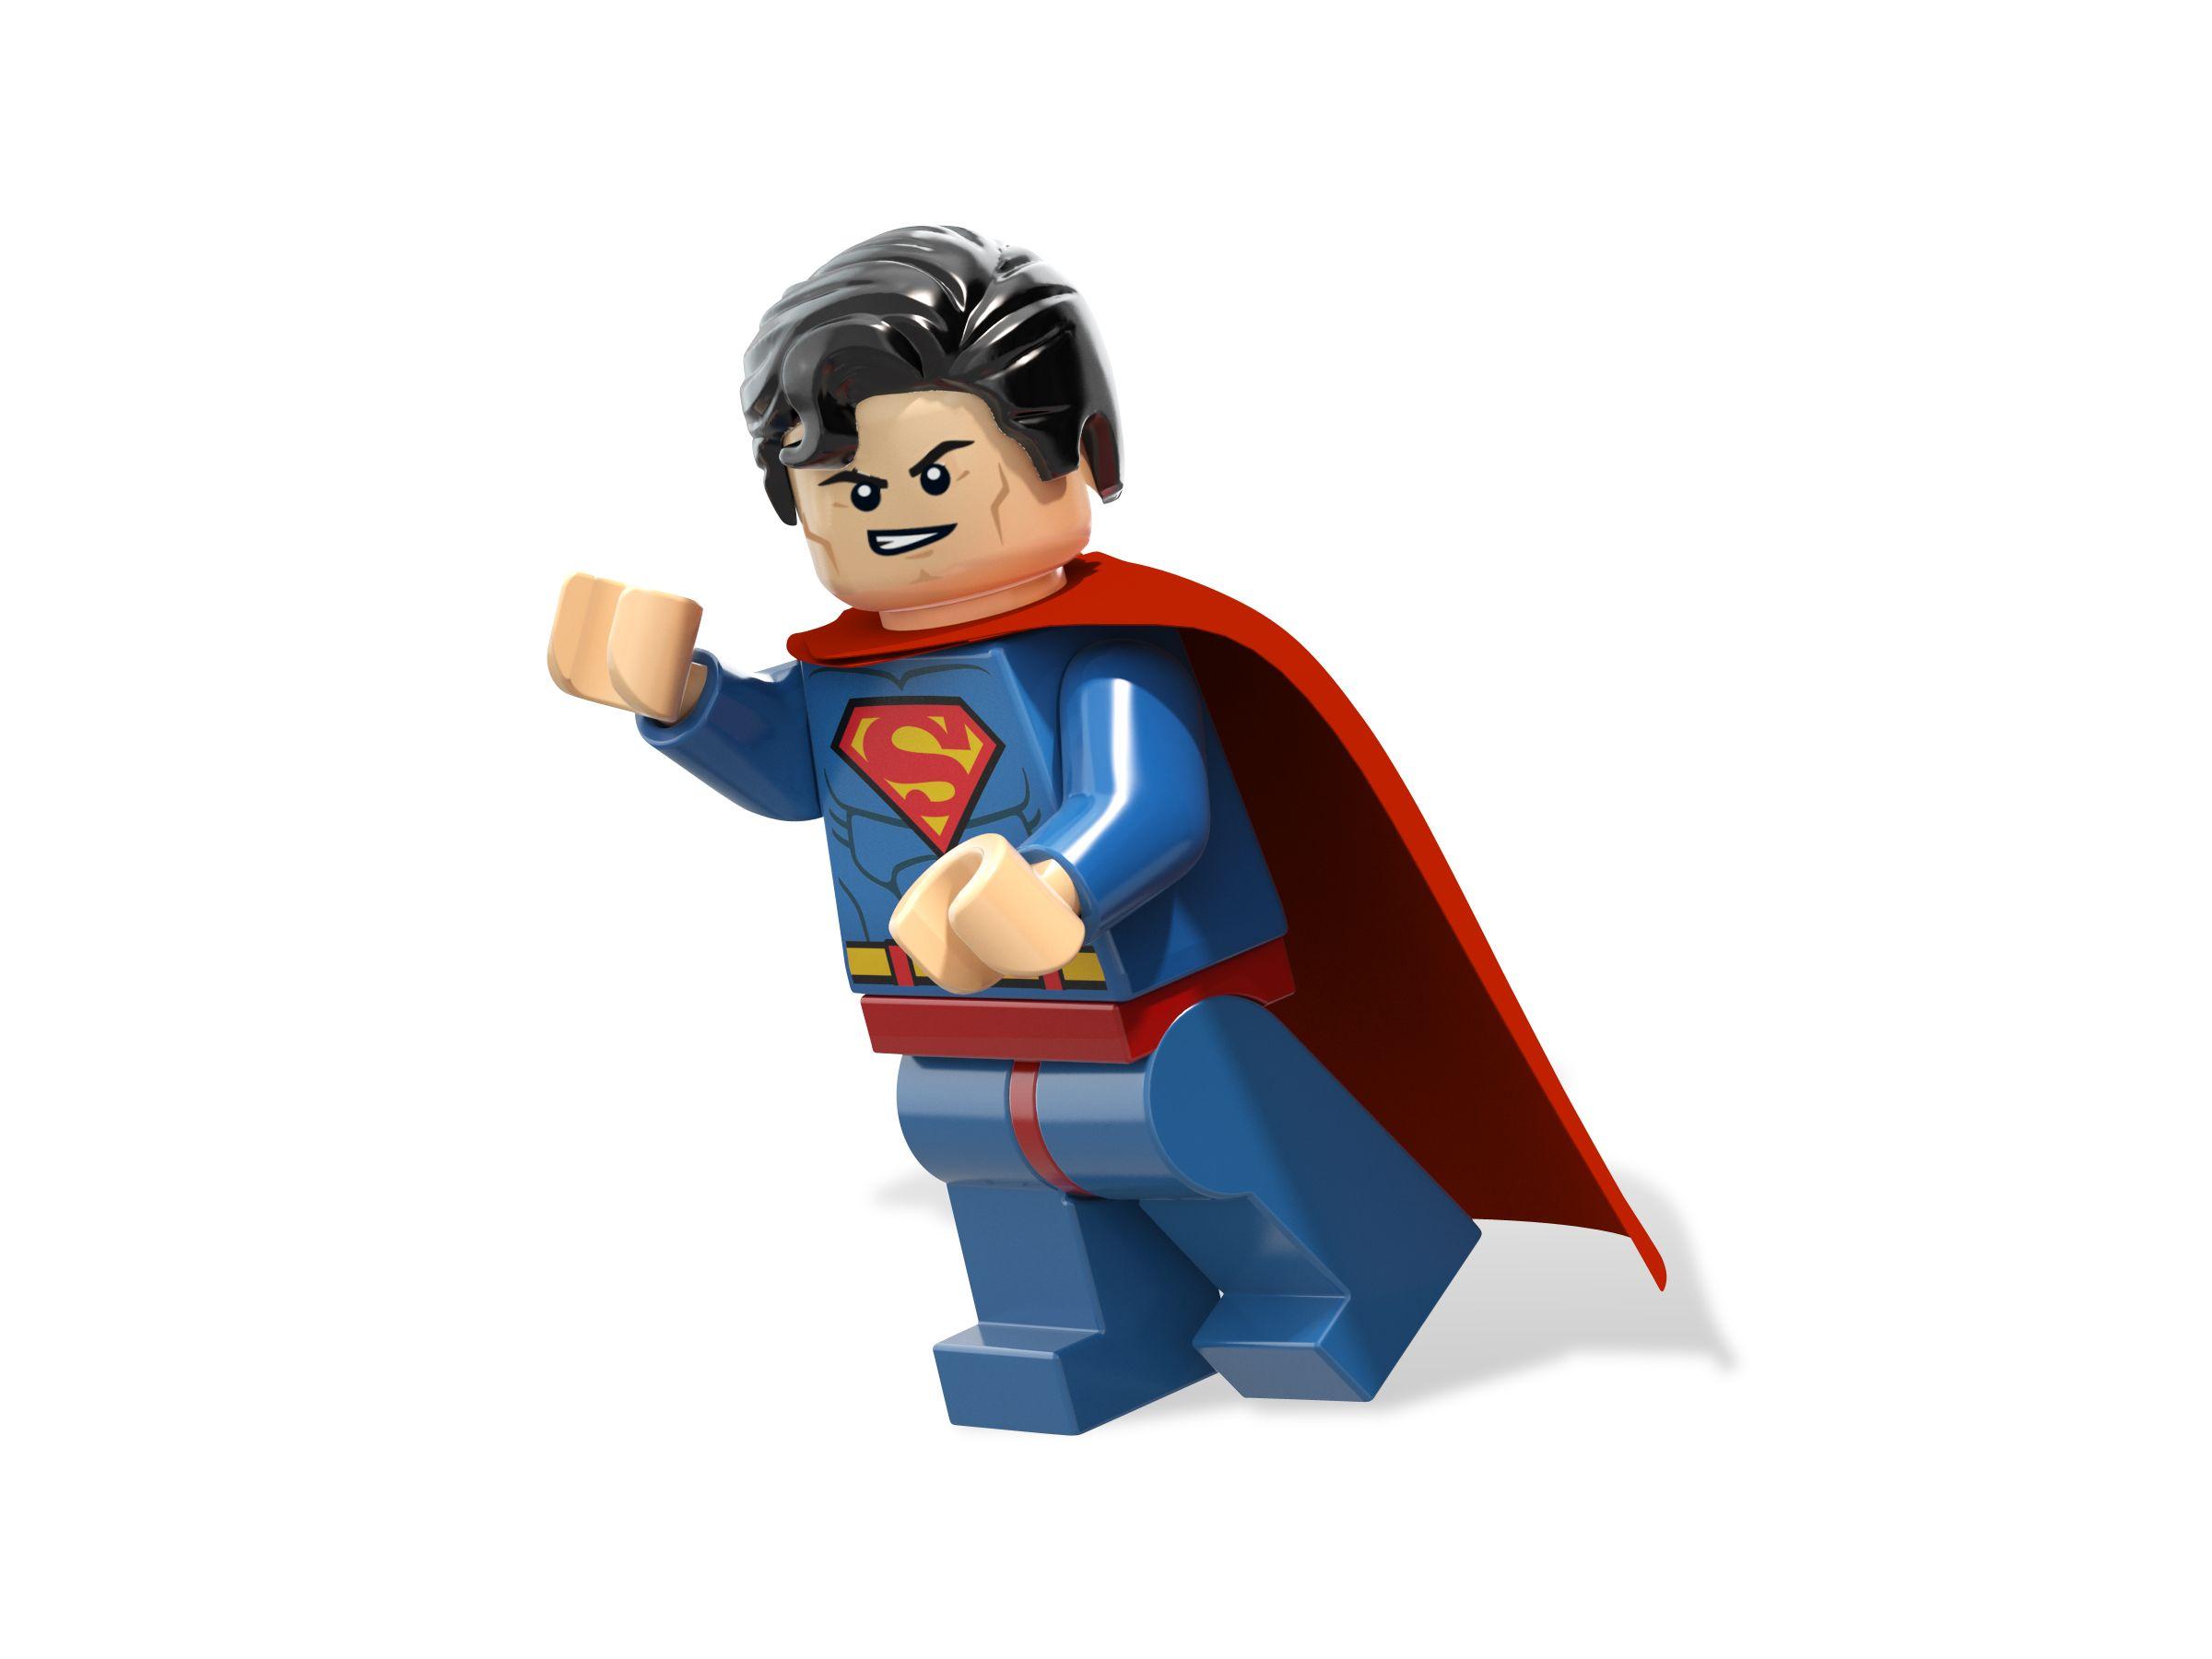 Lego clipart superman Heroes Image  6862 FANDOM